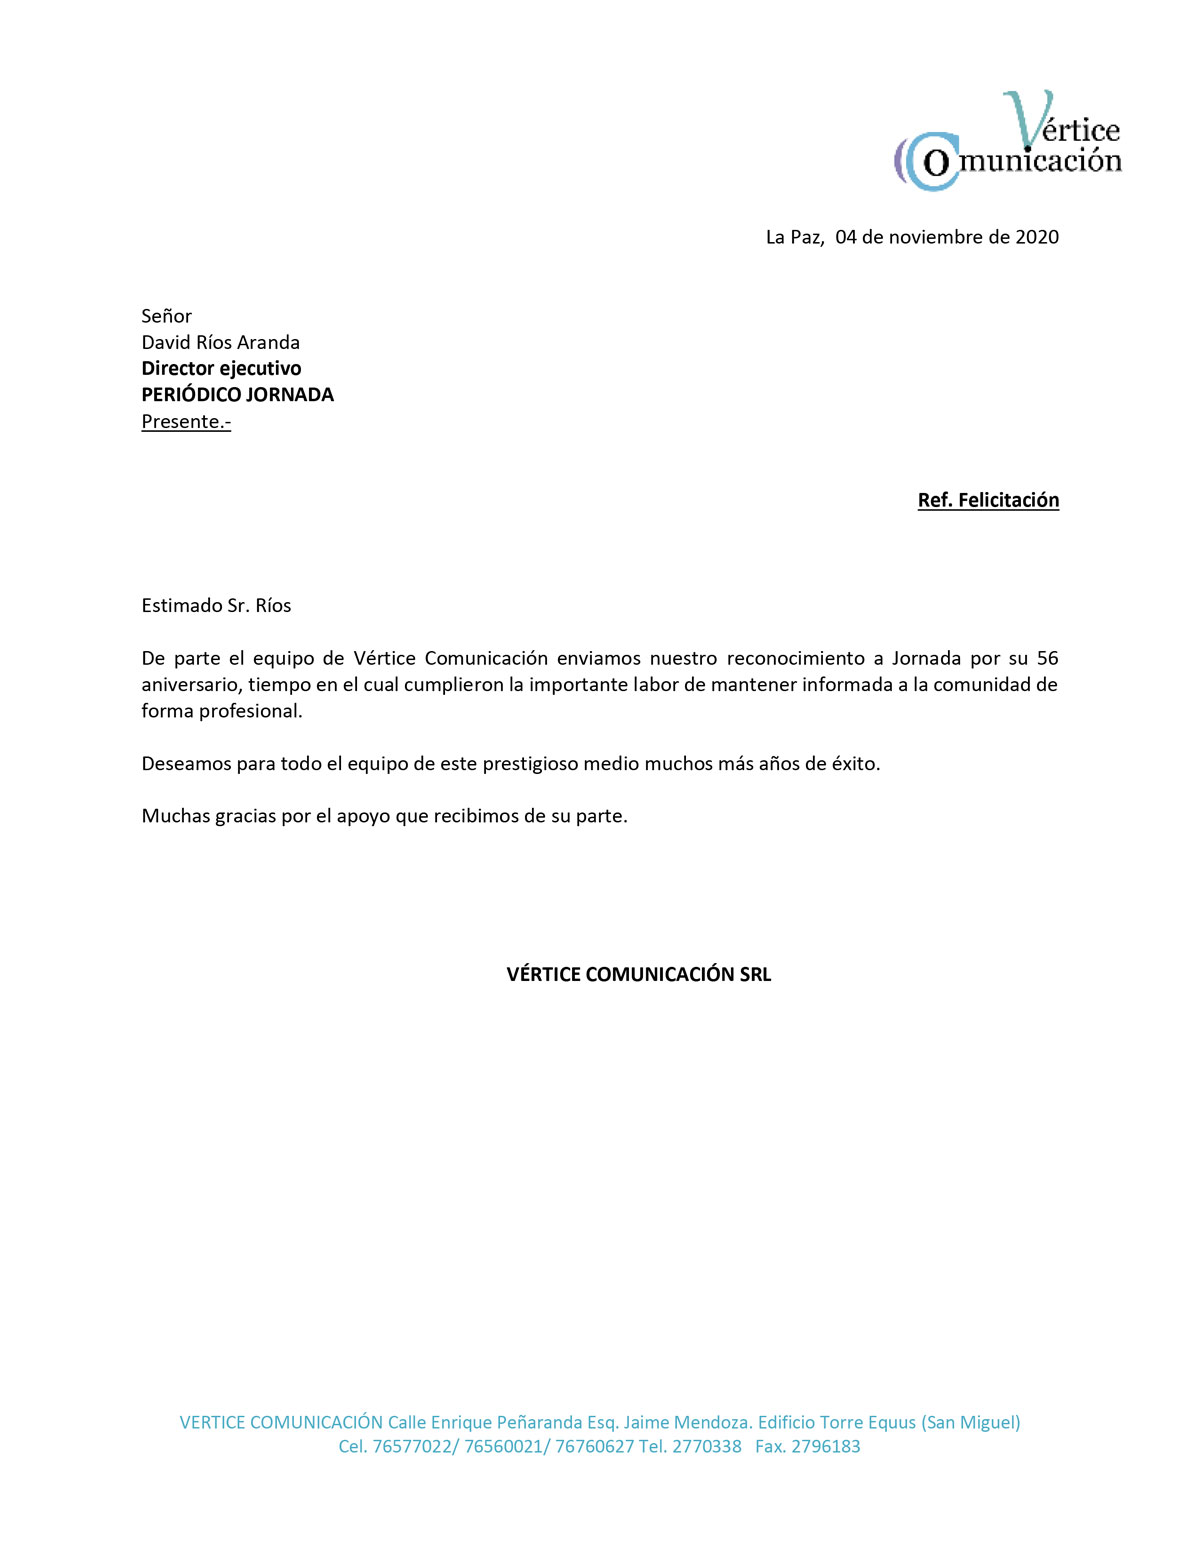 felicitacion Vertice Comunicacion